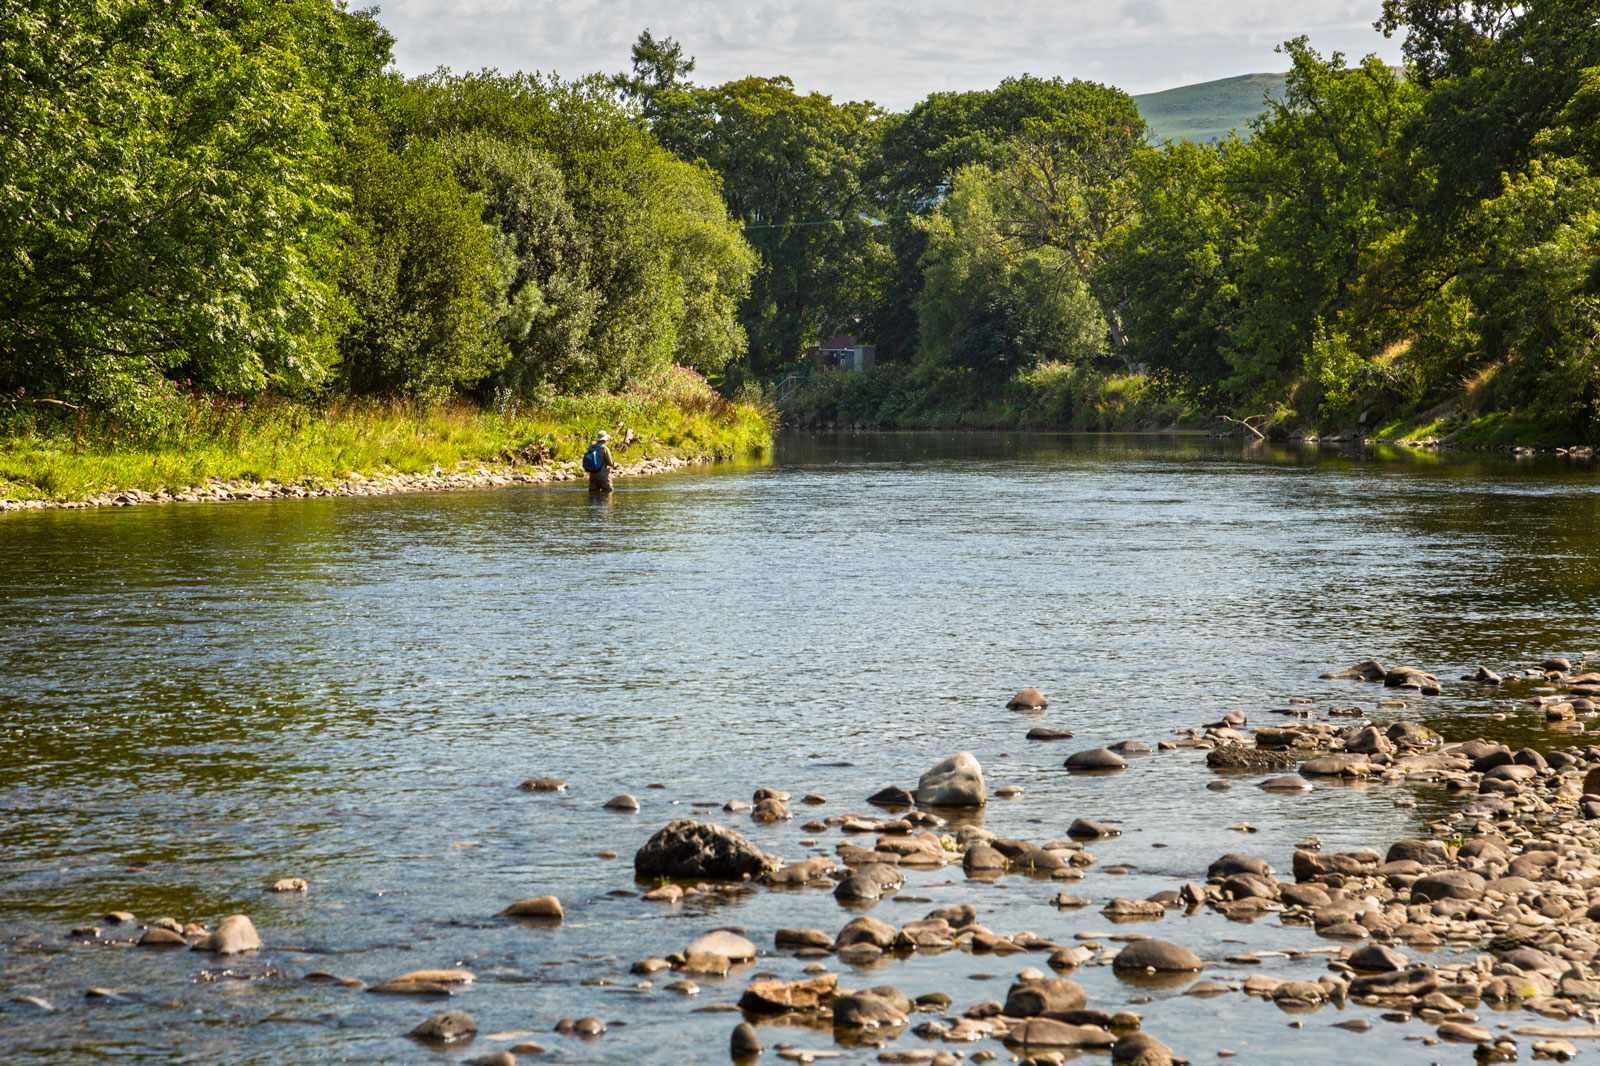 River-Wye-9-©-Crown-copyright-2018-Visit-Wales-8afba65